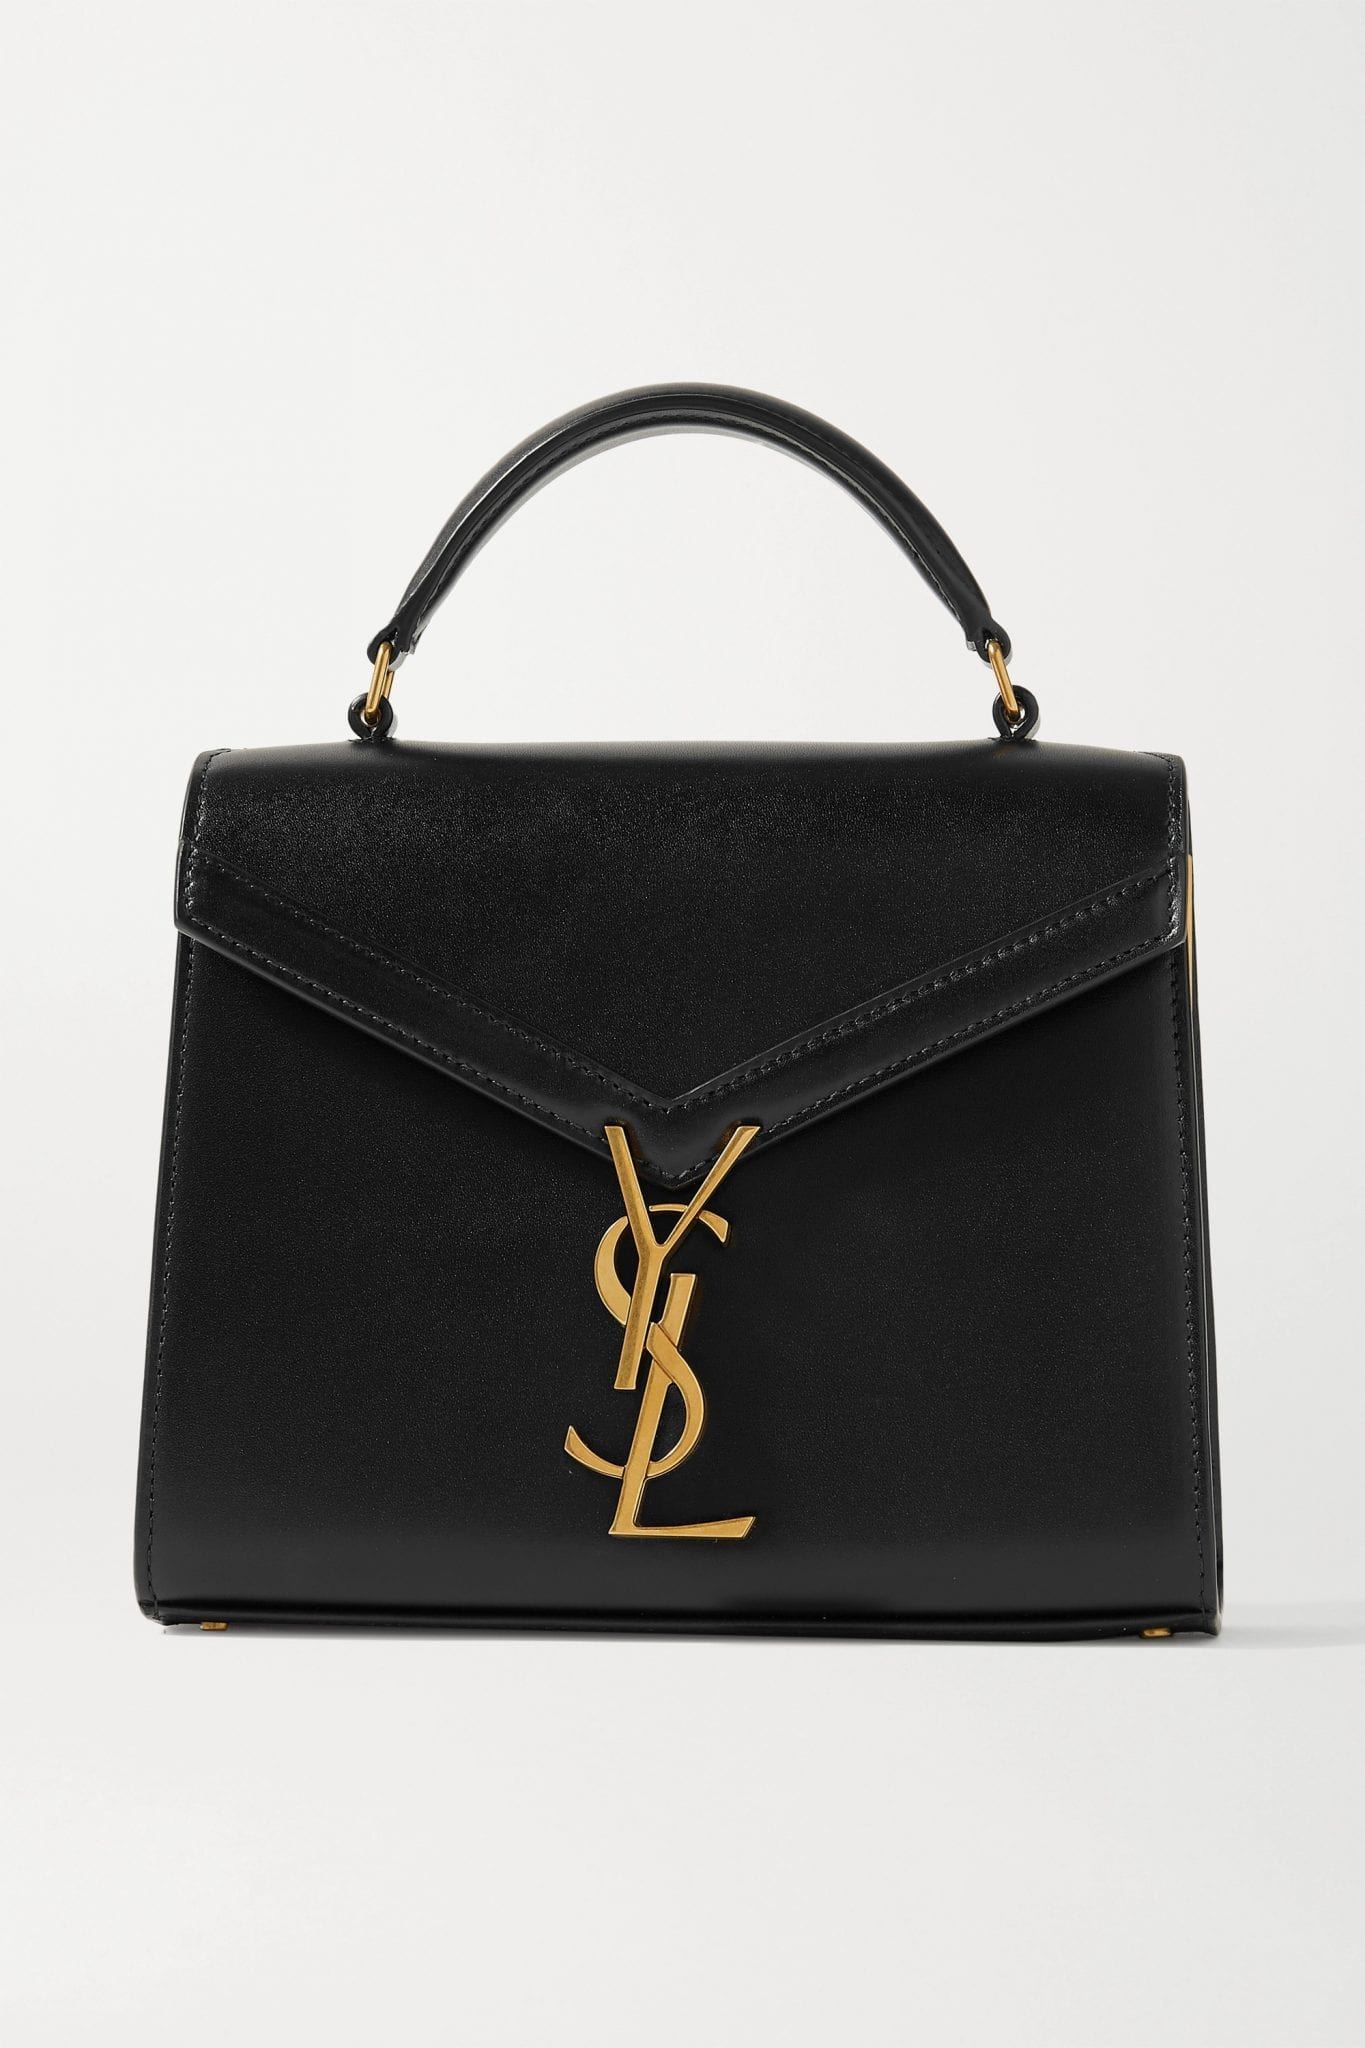 SAINT LAURENT Cassandra Mini Leather Tote Bag